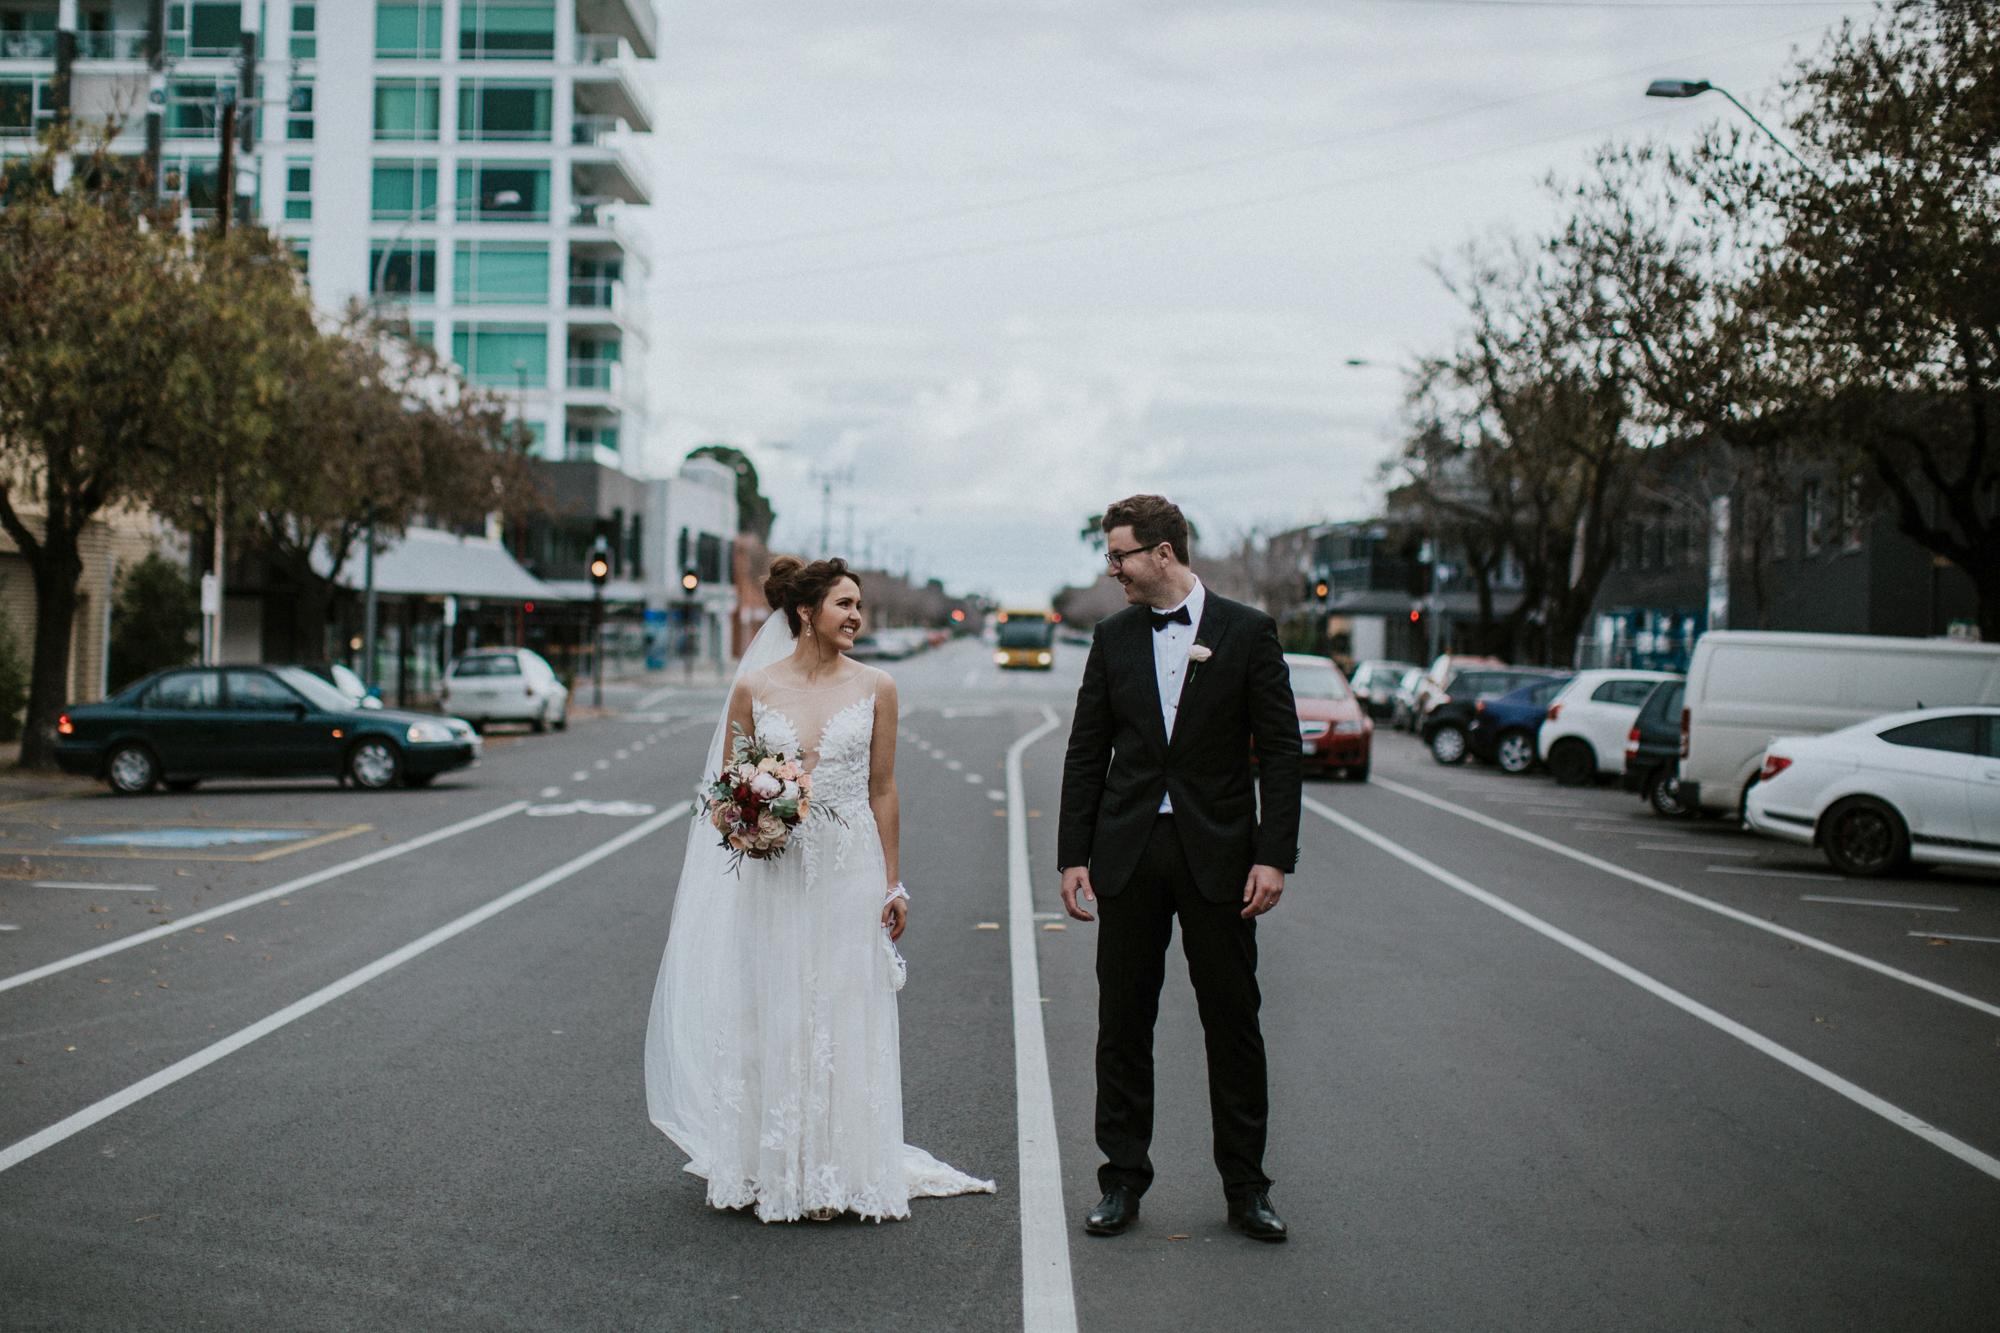 Dan Evans Photography Adelaide Based Wedding Destination Photographer Keira James St Cyprians Church South Australian 003